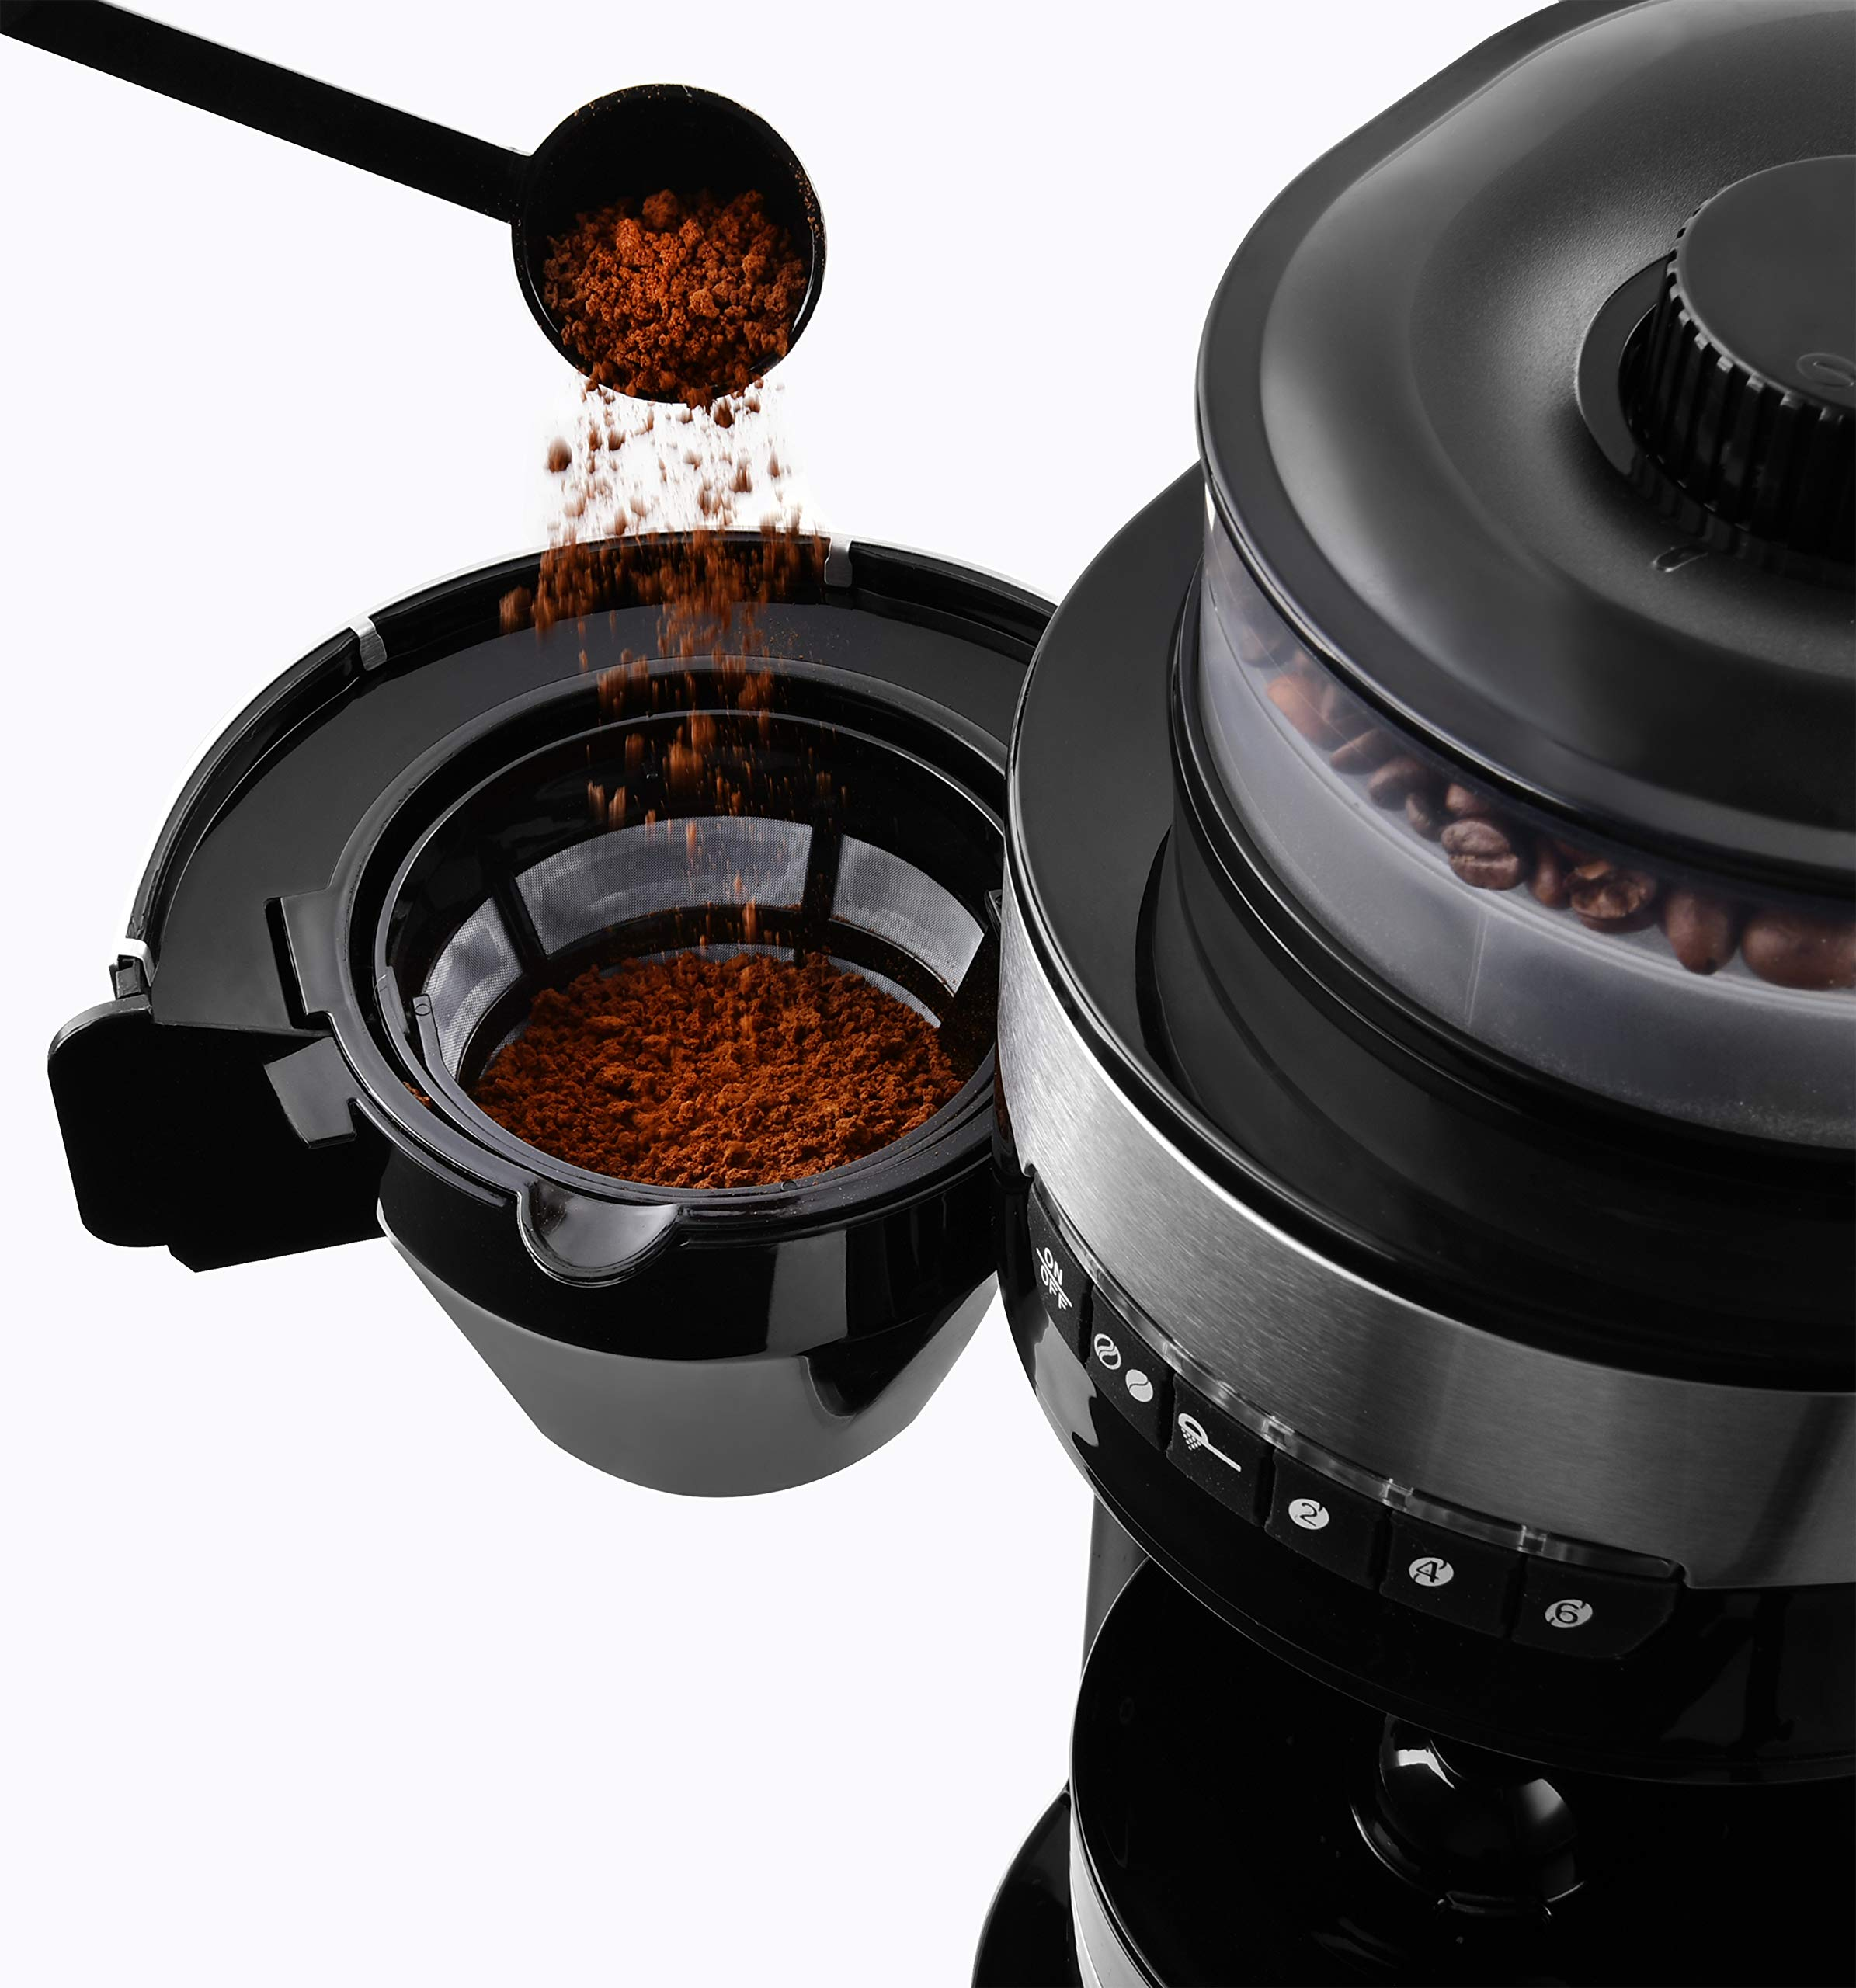 Venga-VG-CCG-3006-Kaffeemaschine-mit-Mahlwerk-750-W-Glas-Kunststoff-Edelstahl-850-ml-Schwarz